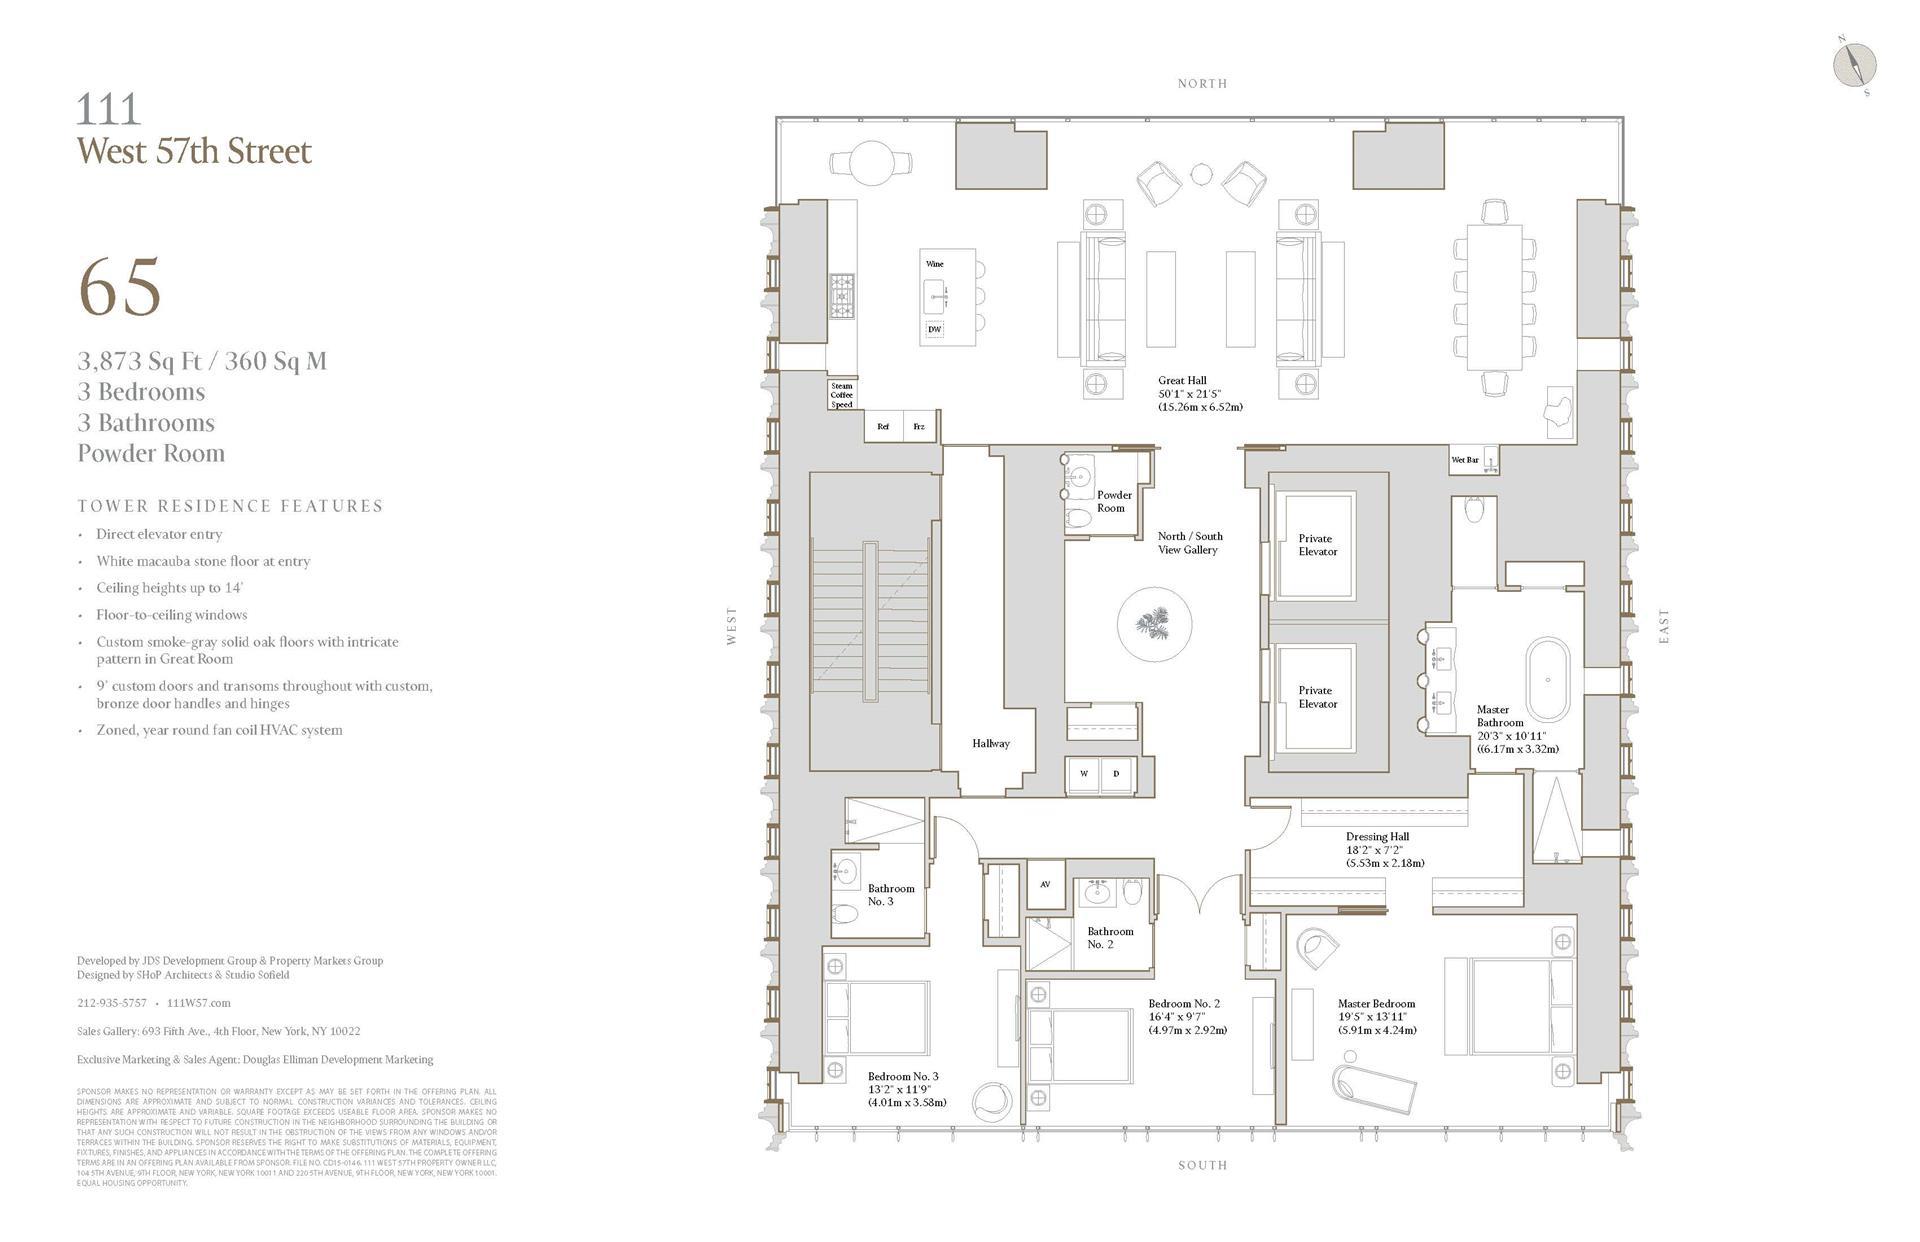 Floor plan of 111 West 57th Street, 65